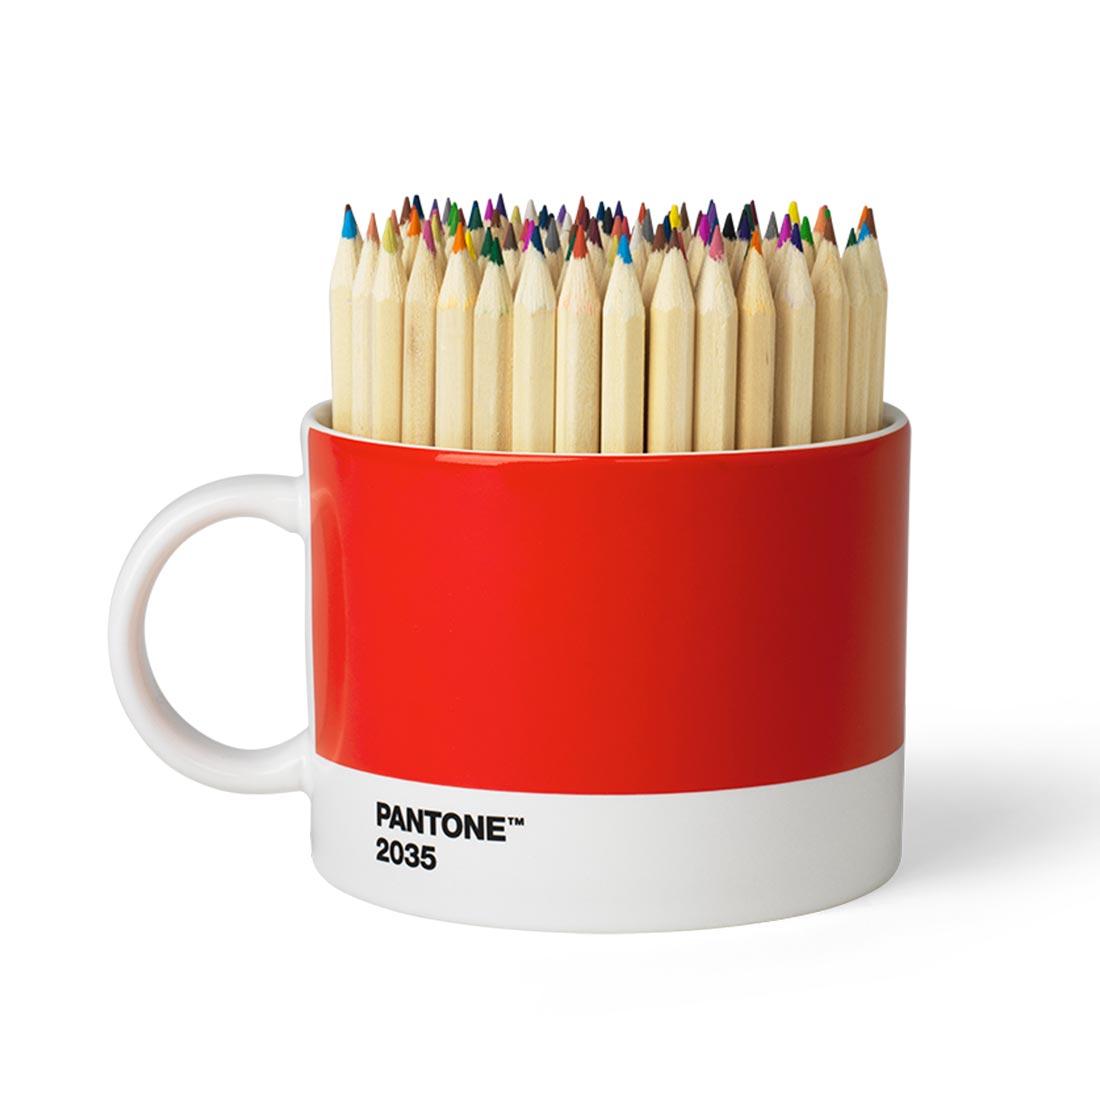 pantone-teetasse-milchkaffeetasse-2035-03-lichtraum24